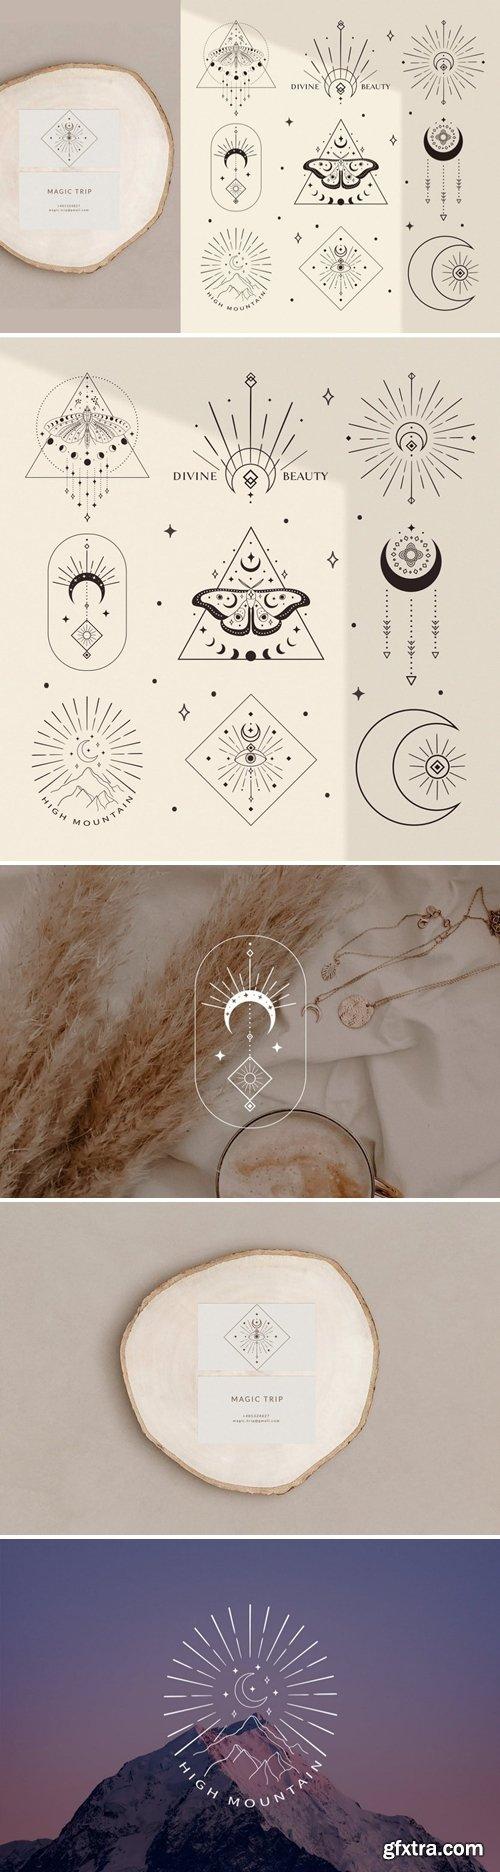 Divine Beauty Esoteric Mystic Illustrations. Stars